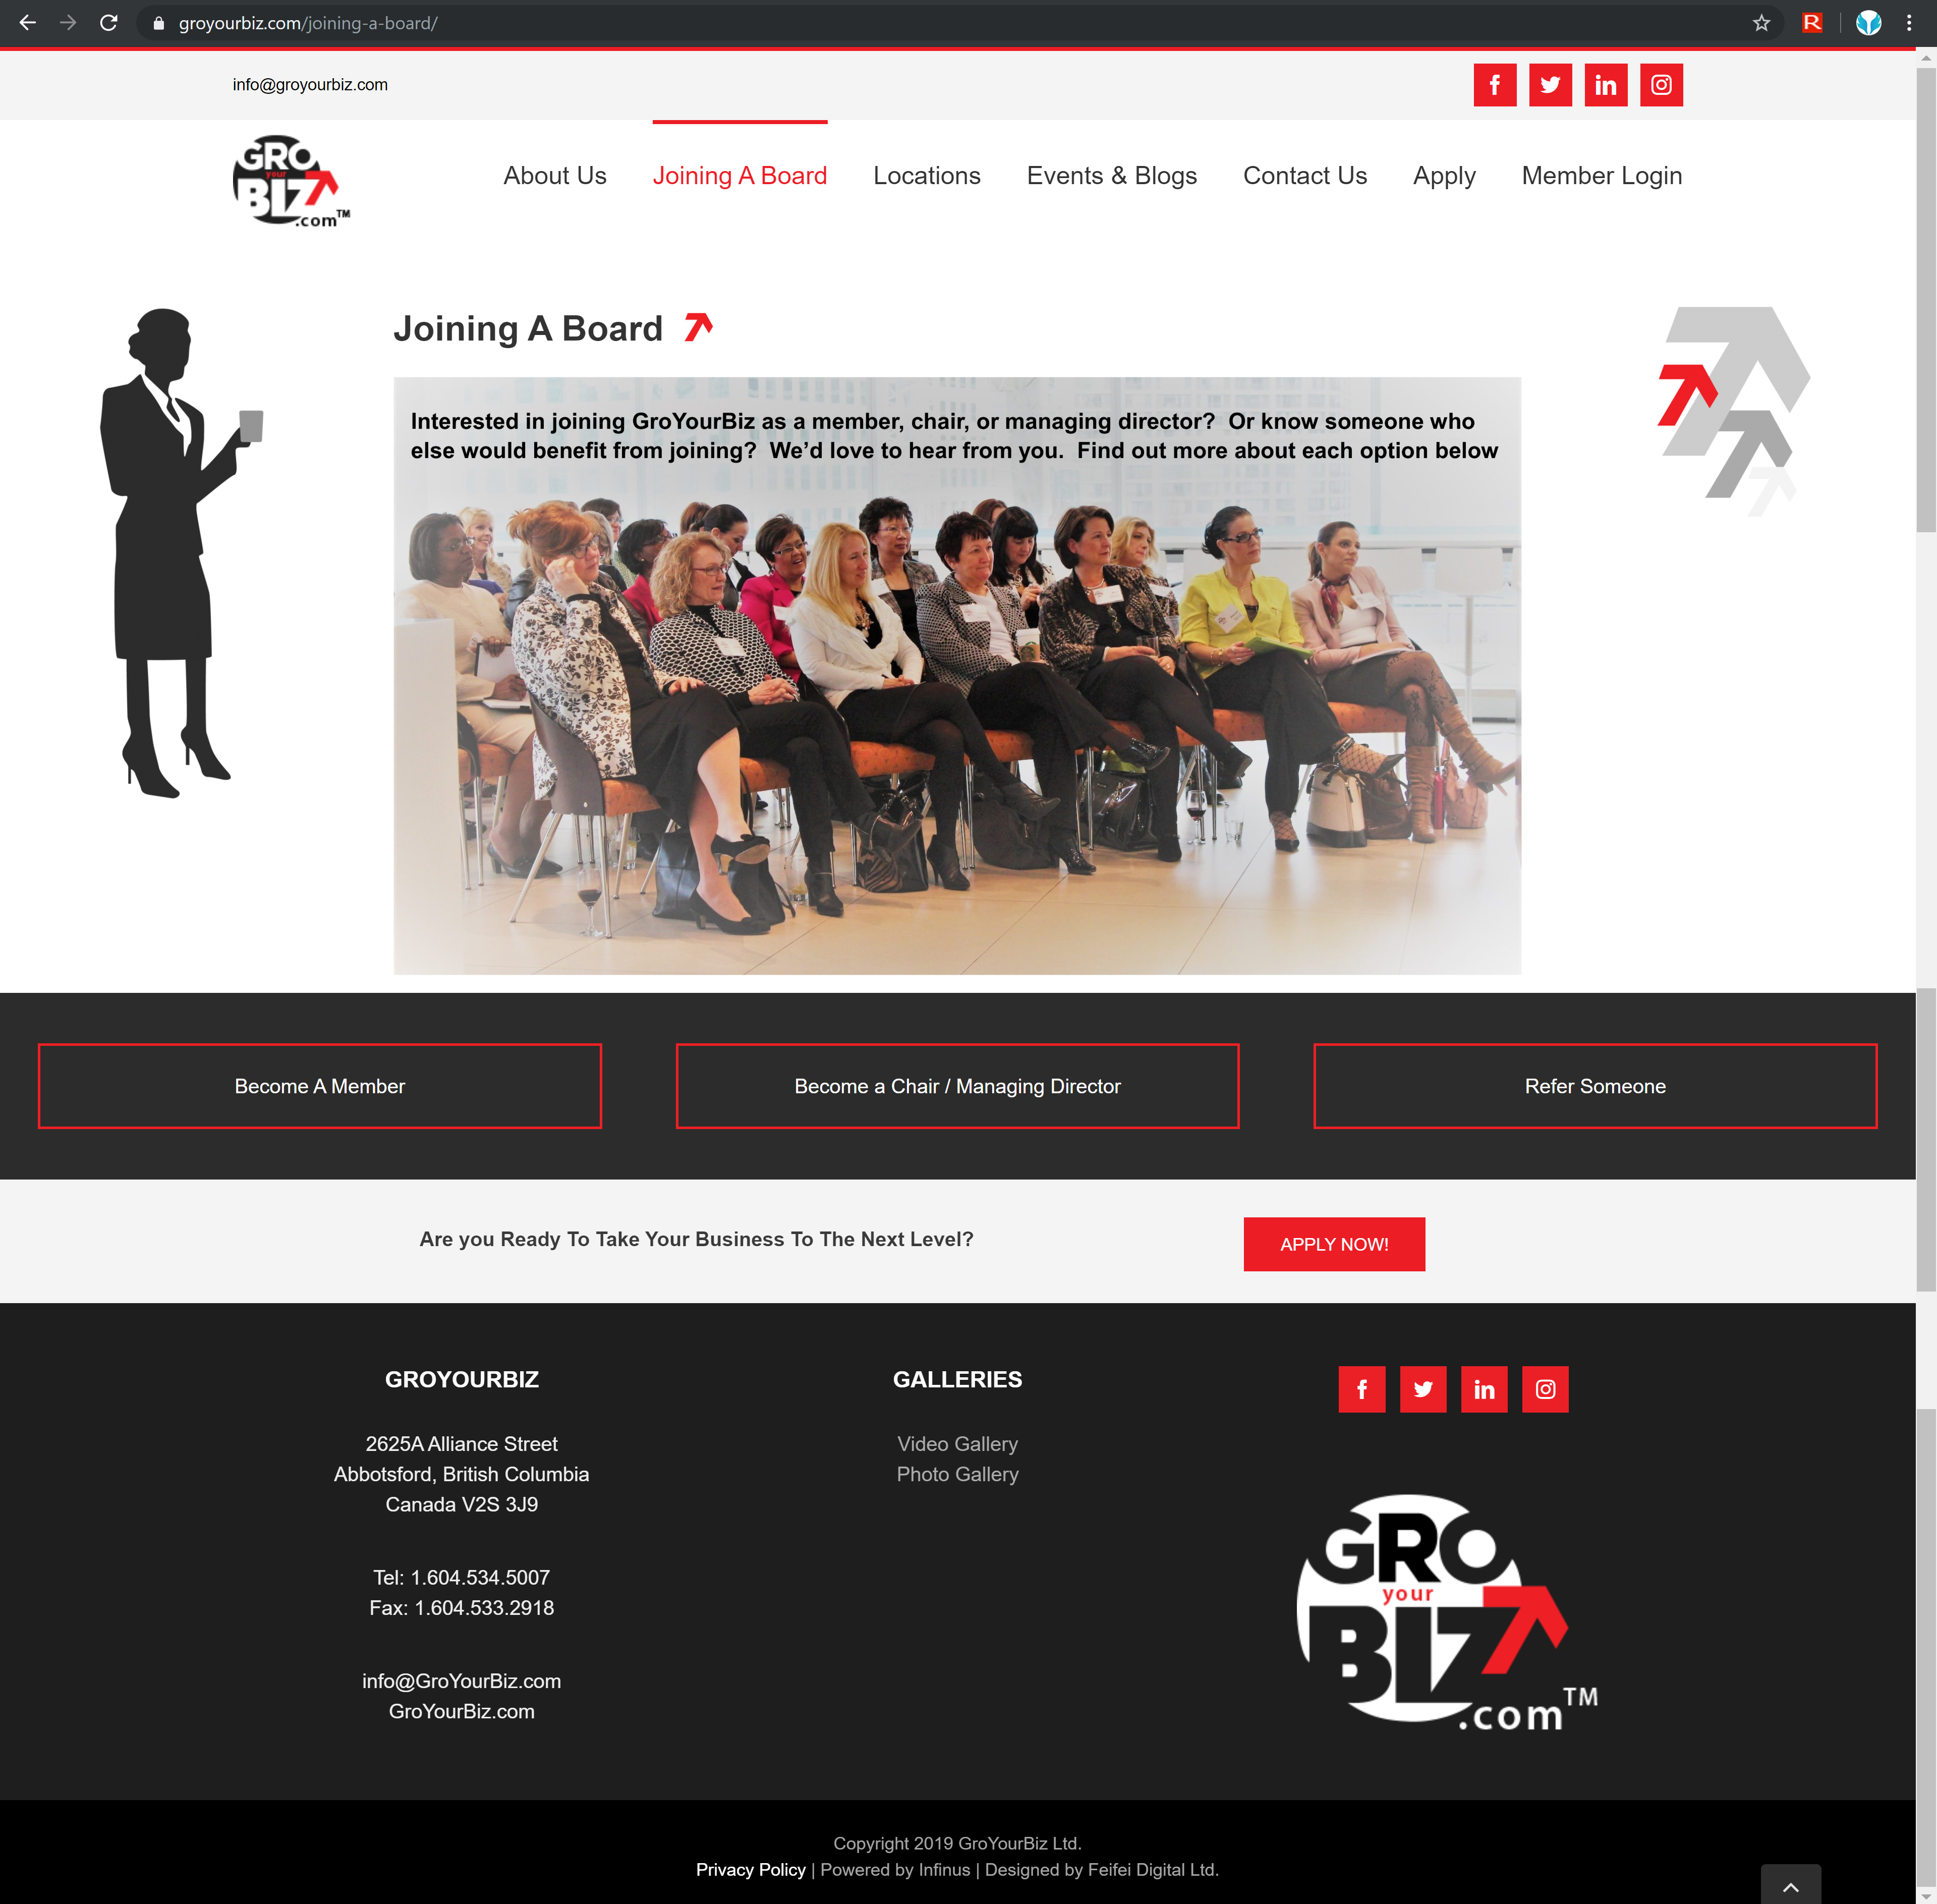 GroYourBiz Joining A Board Page | User Interface and Front End Development | Feifei Digital | Monika Szucs